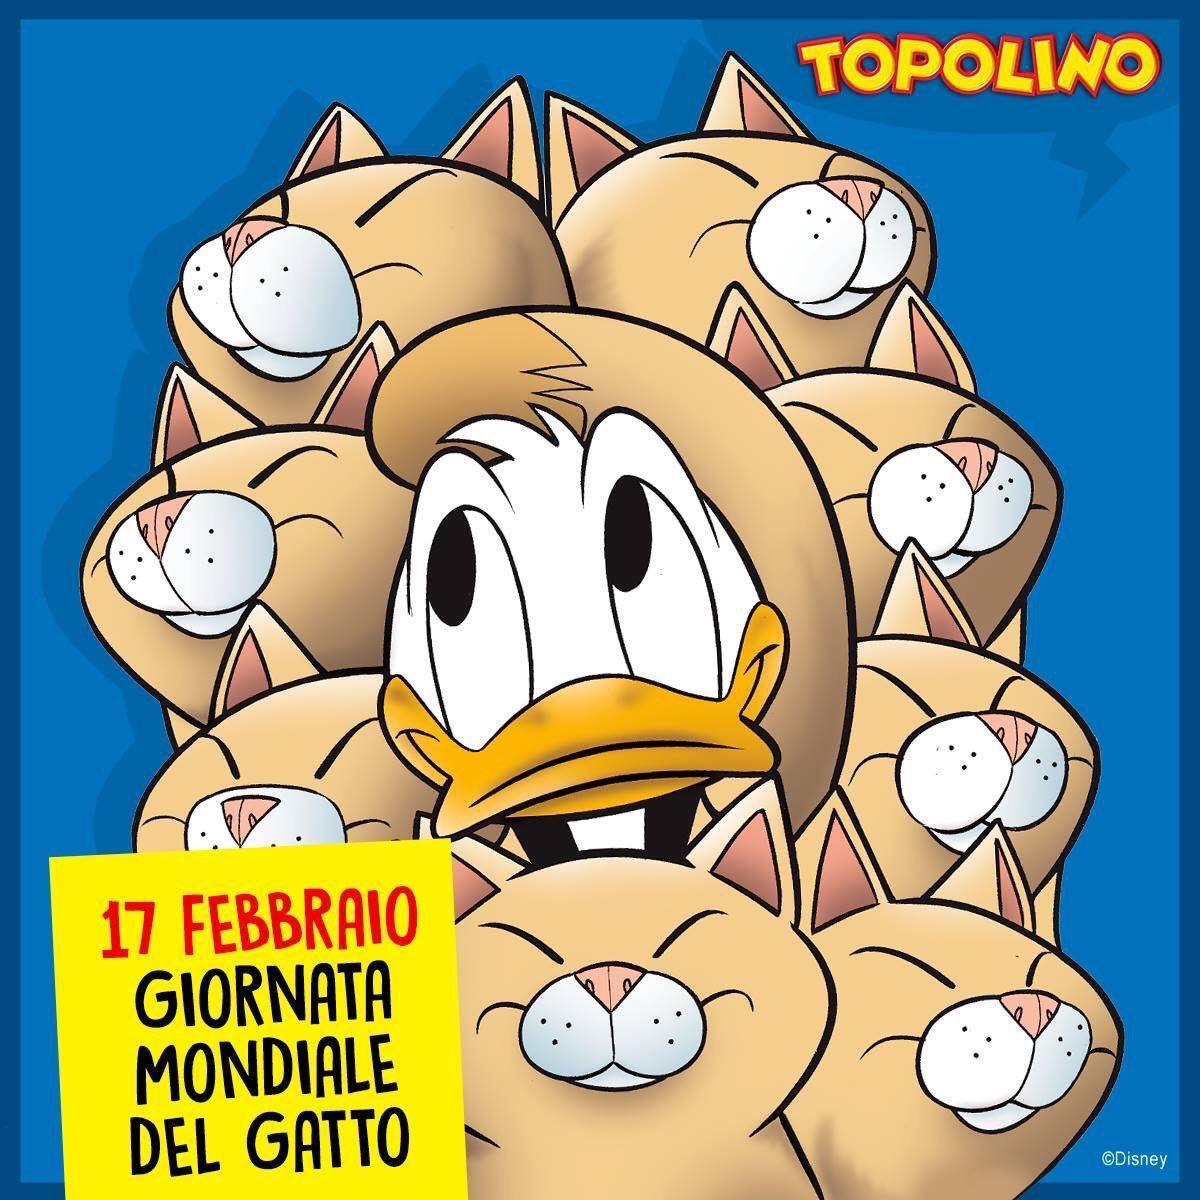 Pin Di Nyargo Su Disney Comics Made In Italy Topolino Gatti Rossi Twitter